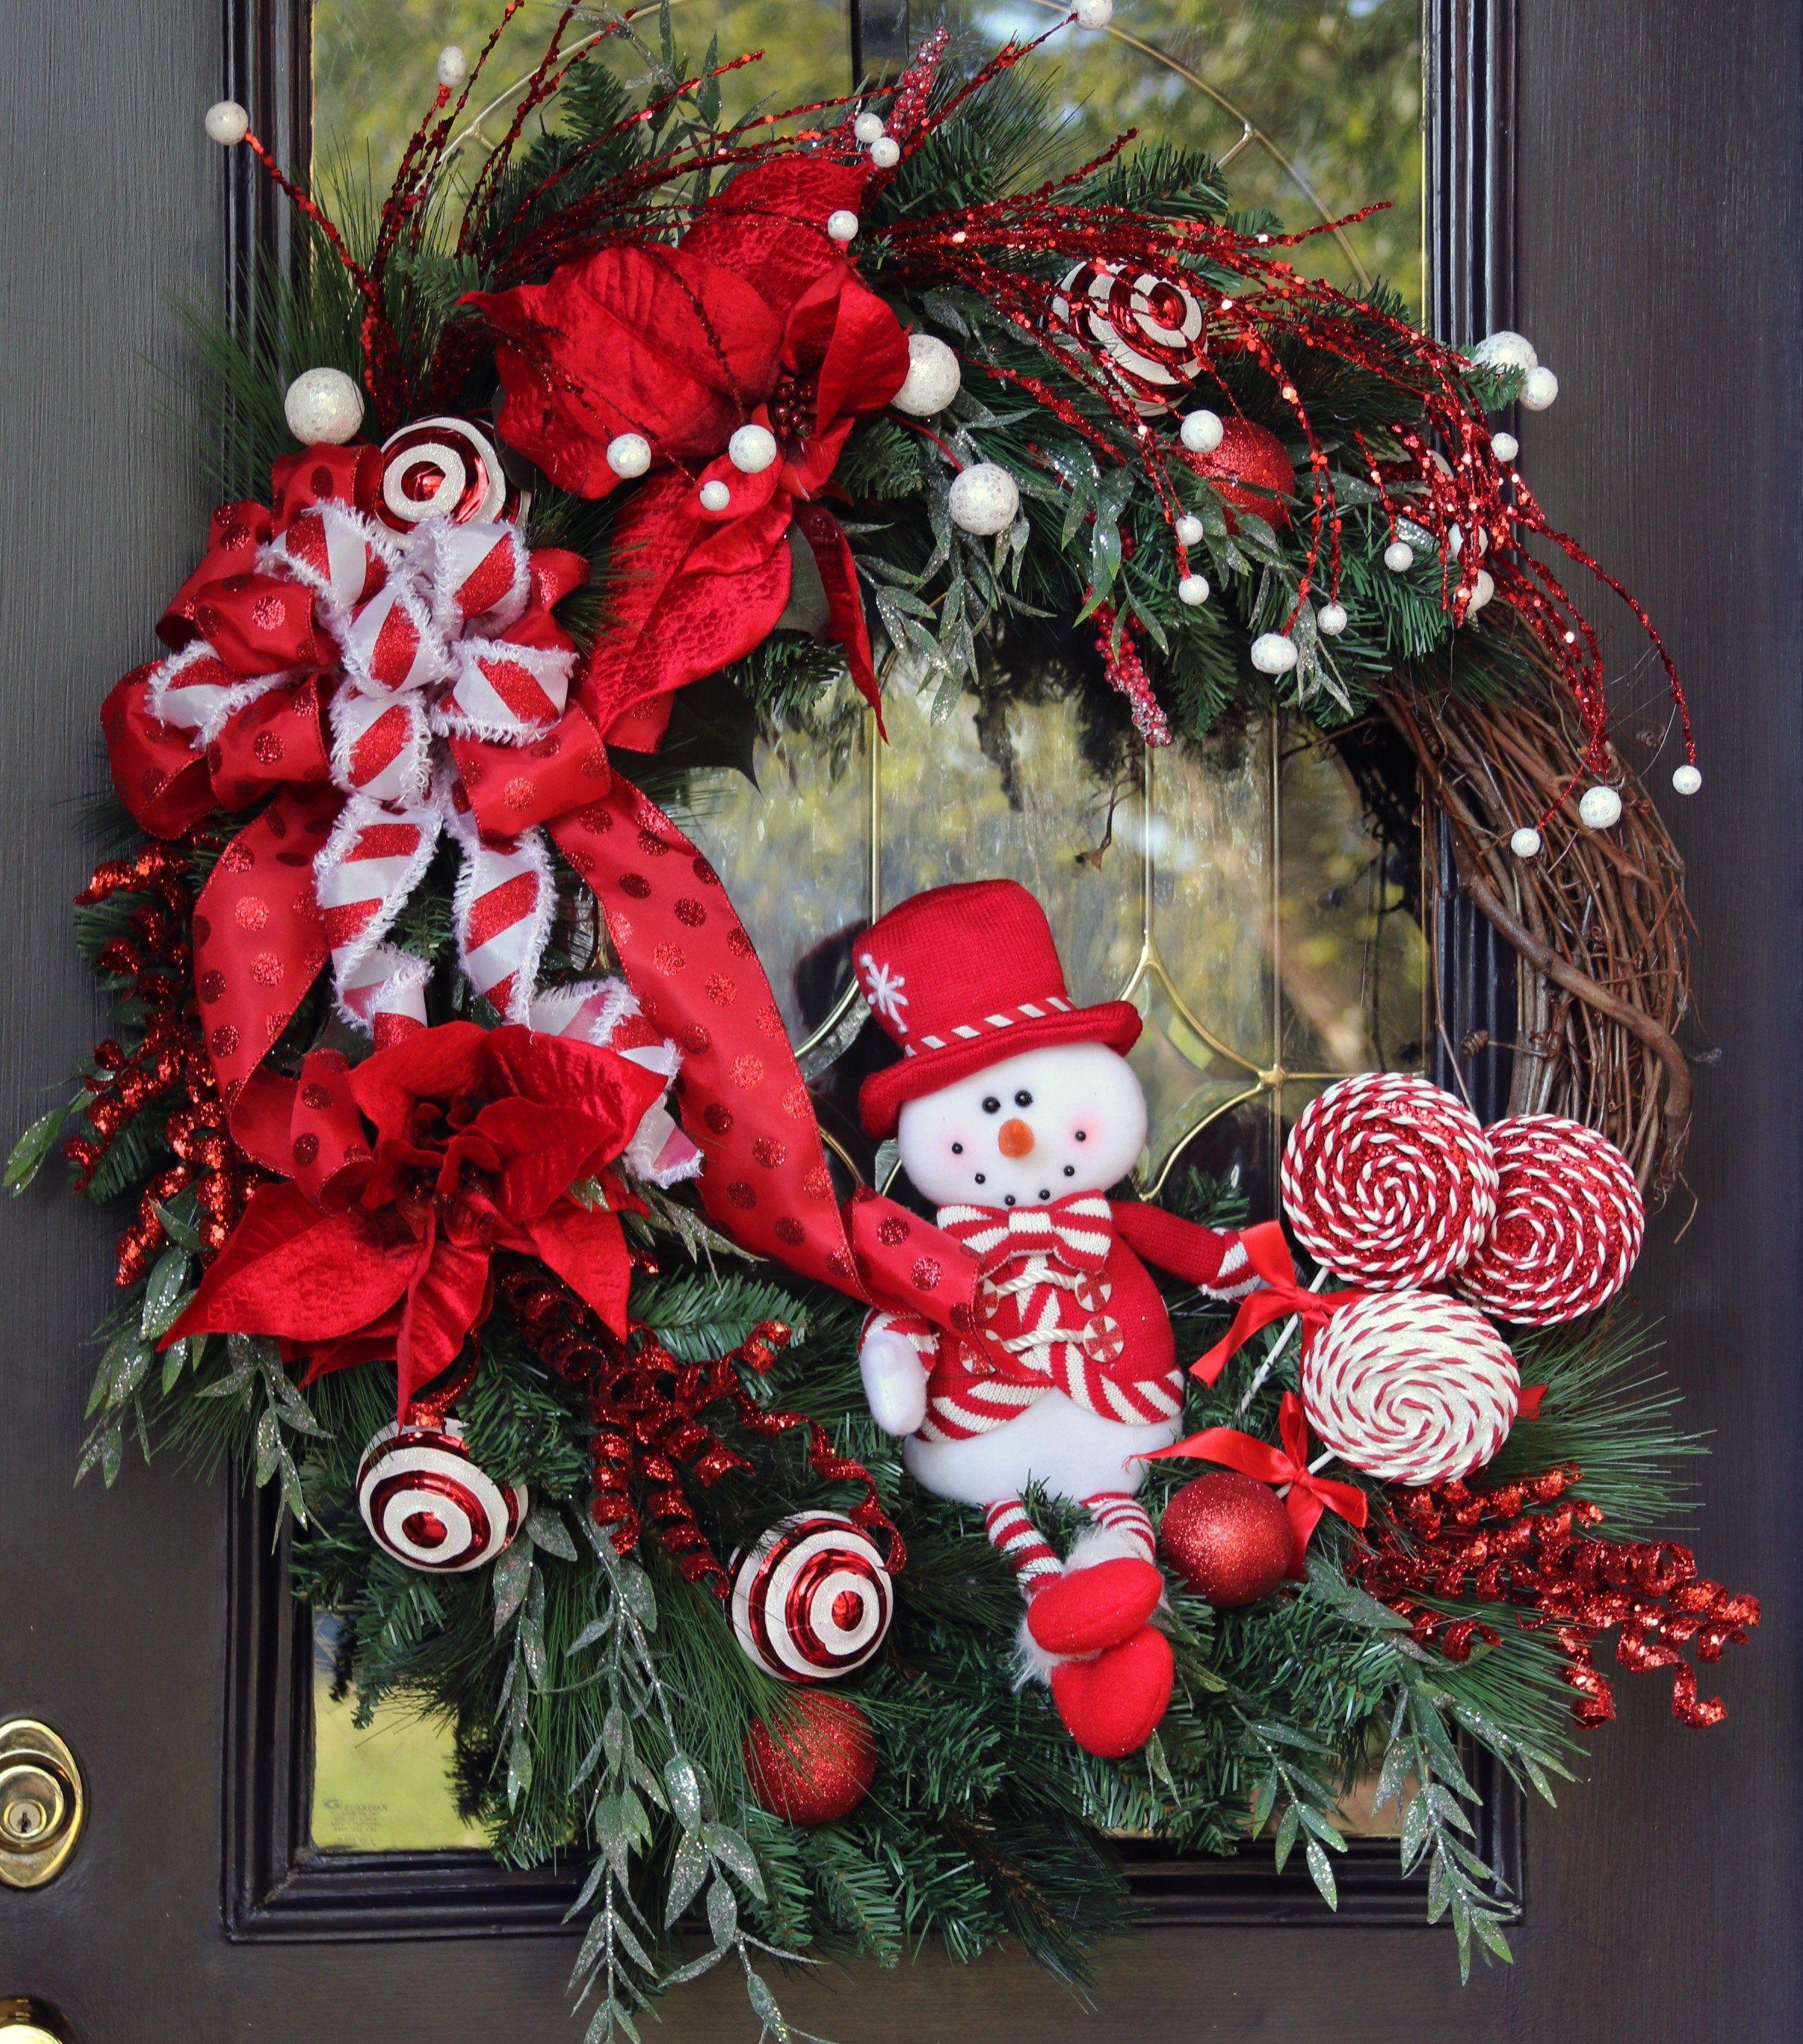 Winter Snowman Wreath Winter Door Wreath Red White Winter Door Wreath Ready To Ship Holiday Candy Cane Decor Classic Winter Decor Christmas Wreaths Classic Christmas Decorations Christmas Door Wreaths